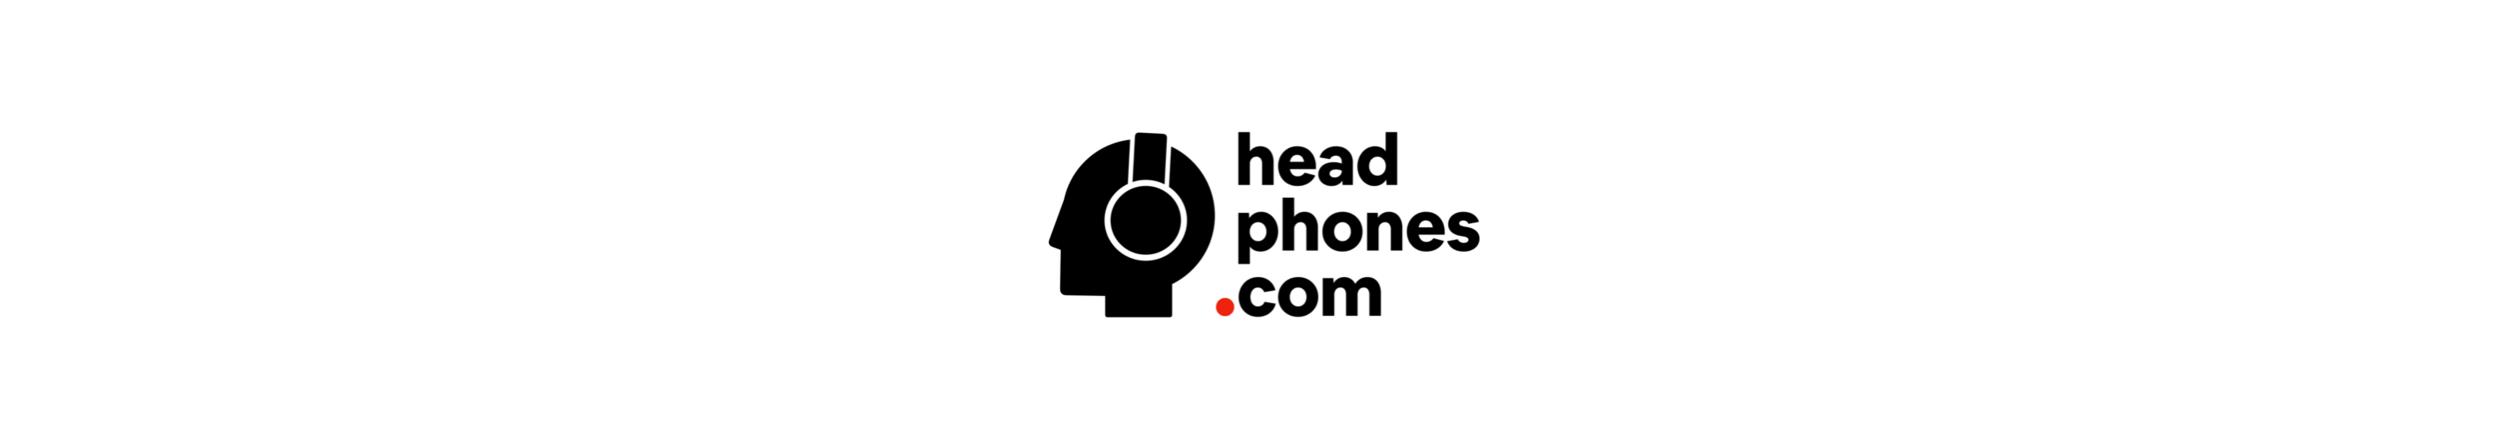 cool-logo-headphone.png